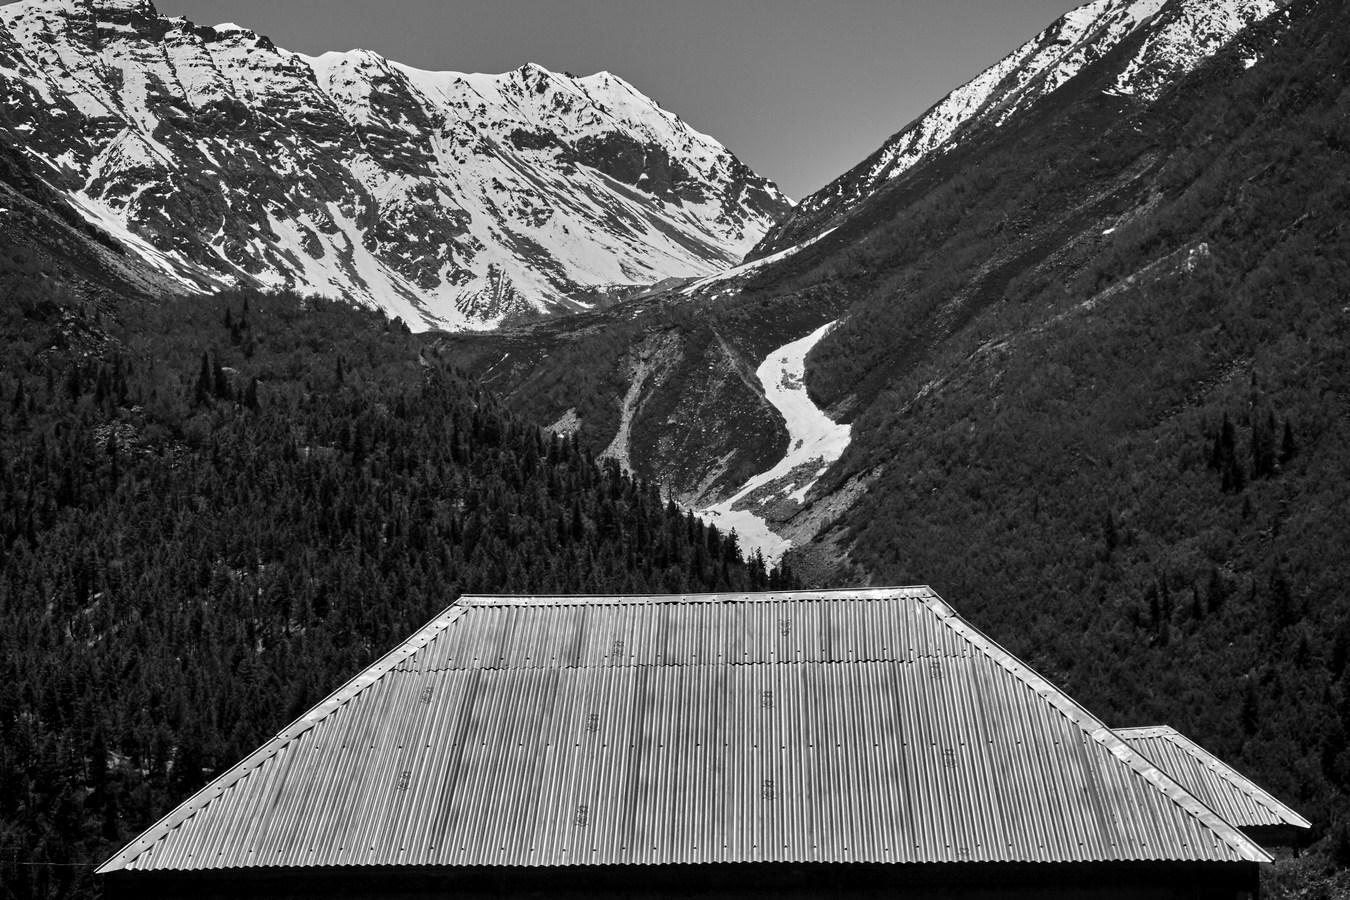 "Chitkul,Himachal Pradesh, India | Photograph | 24"" x 36"" | 2015"